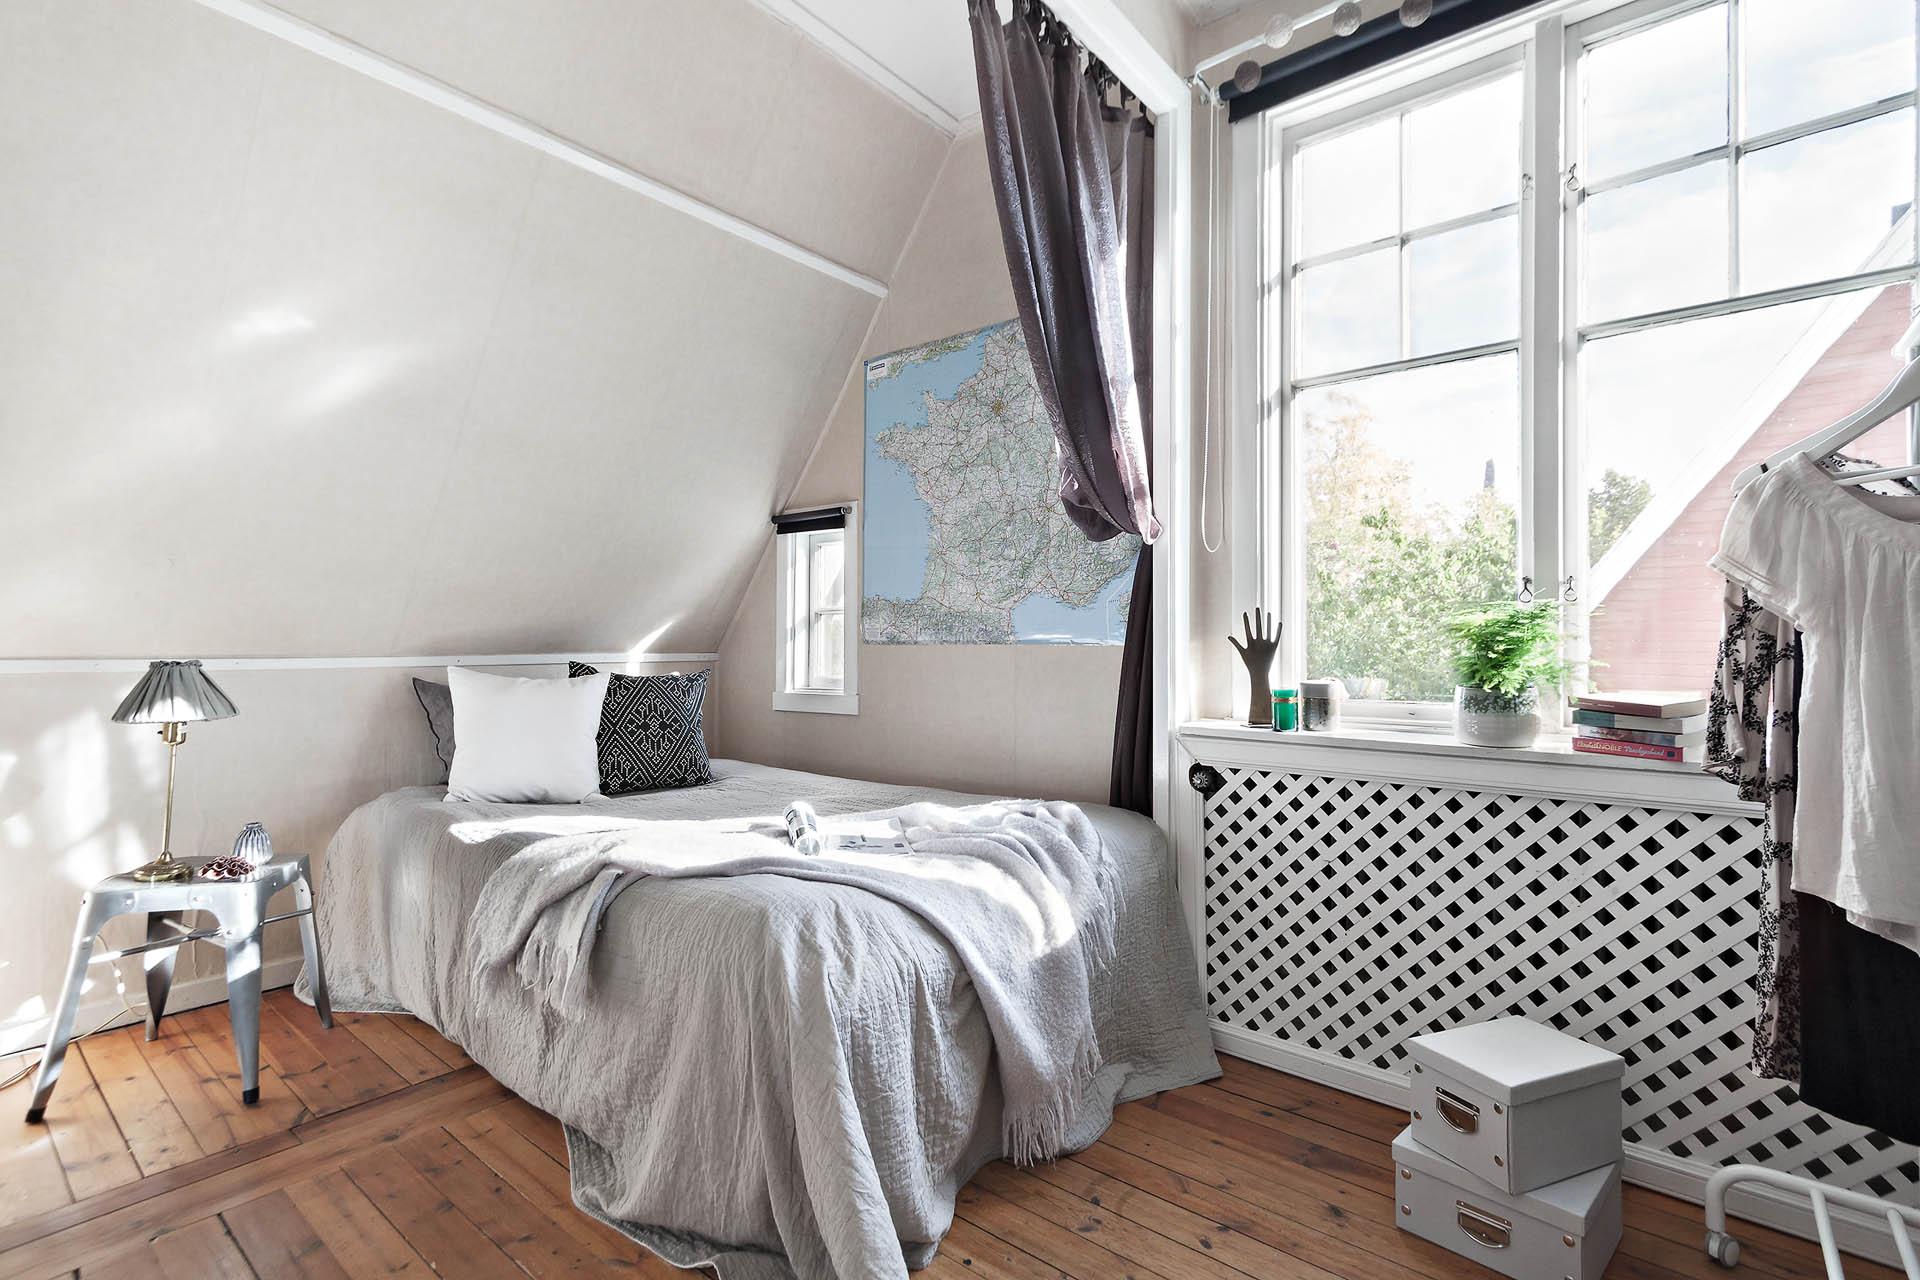 Sovrum med stort fönster